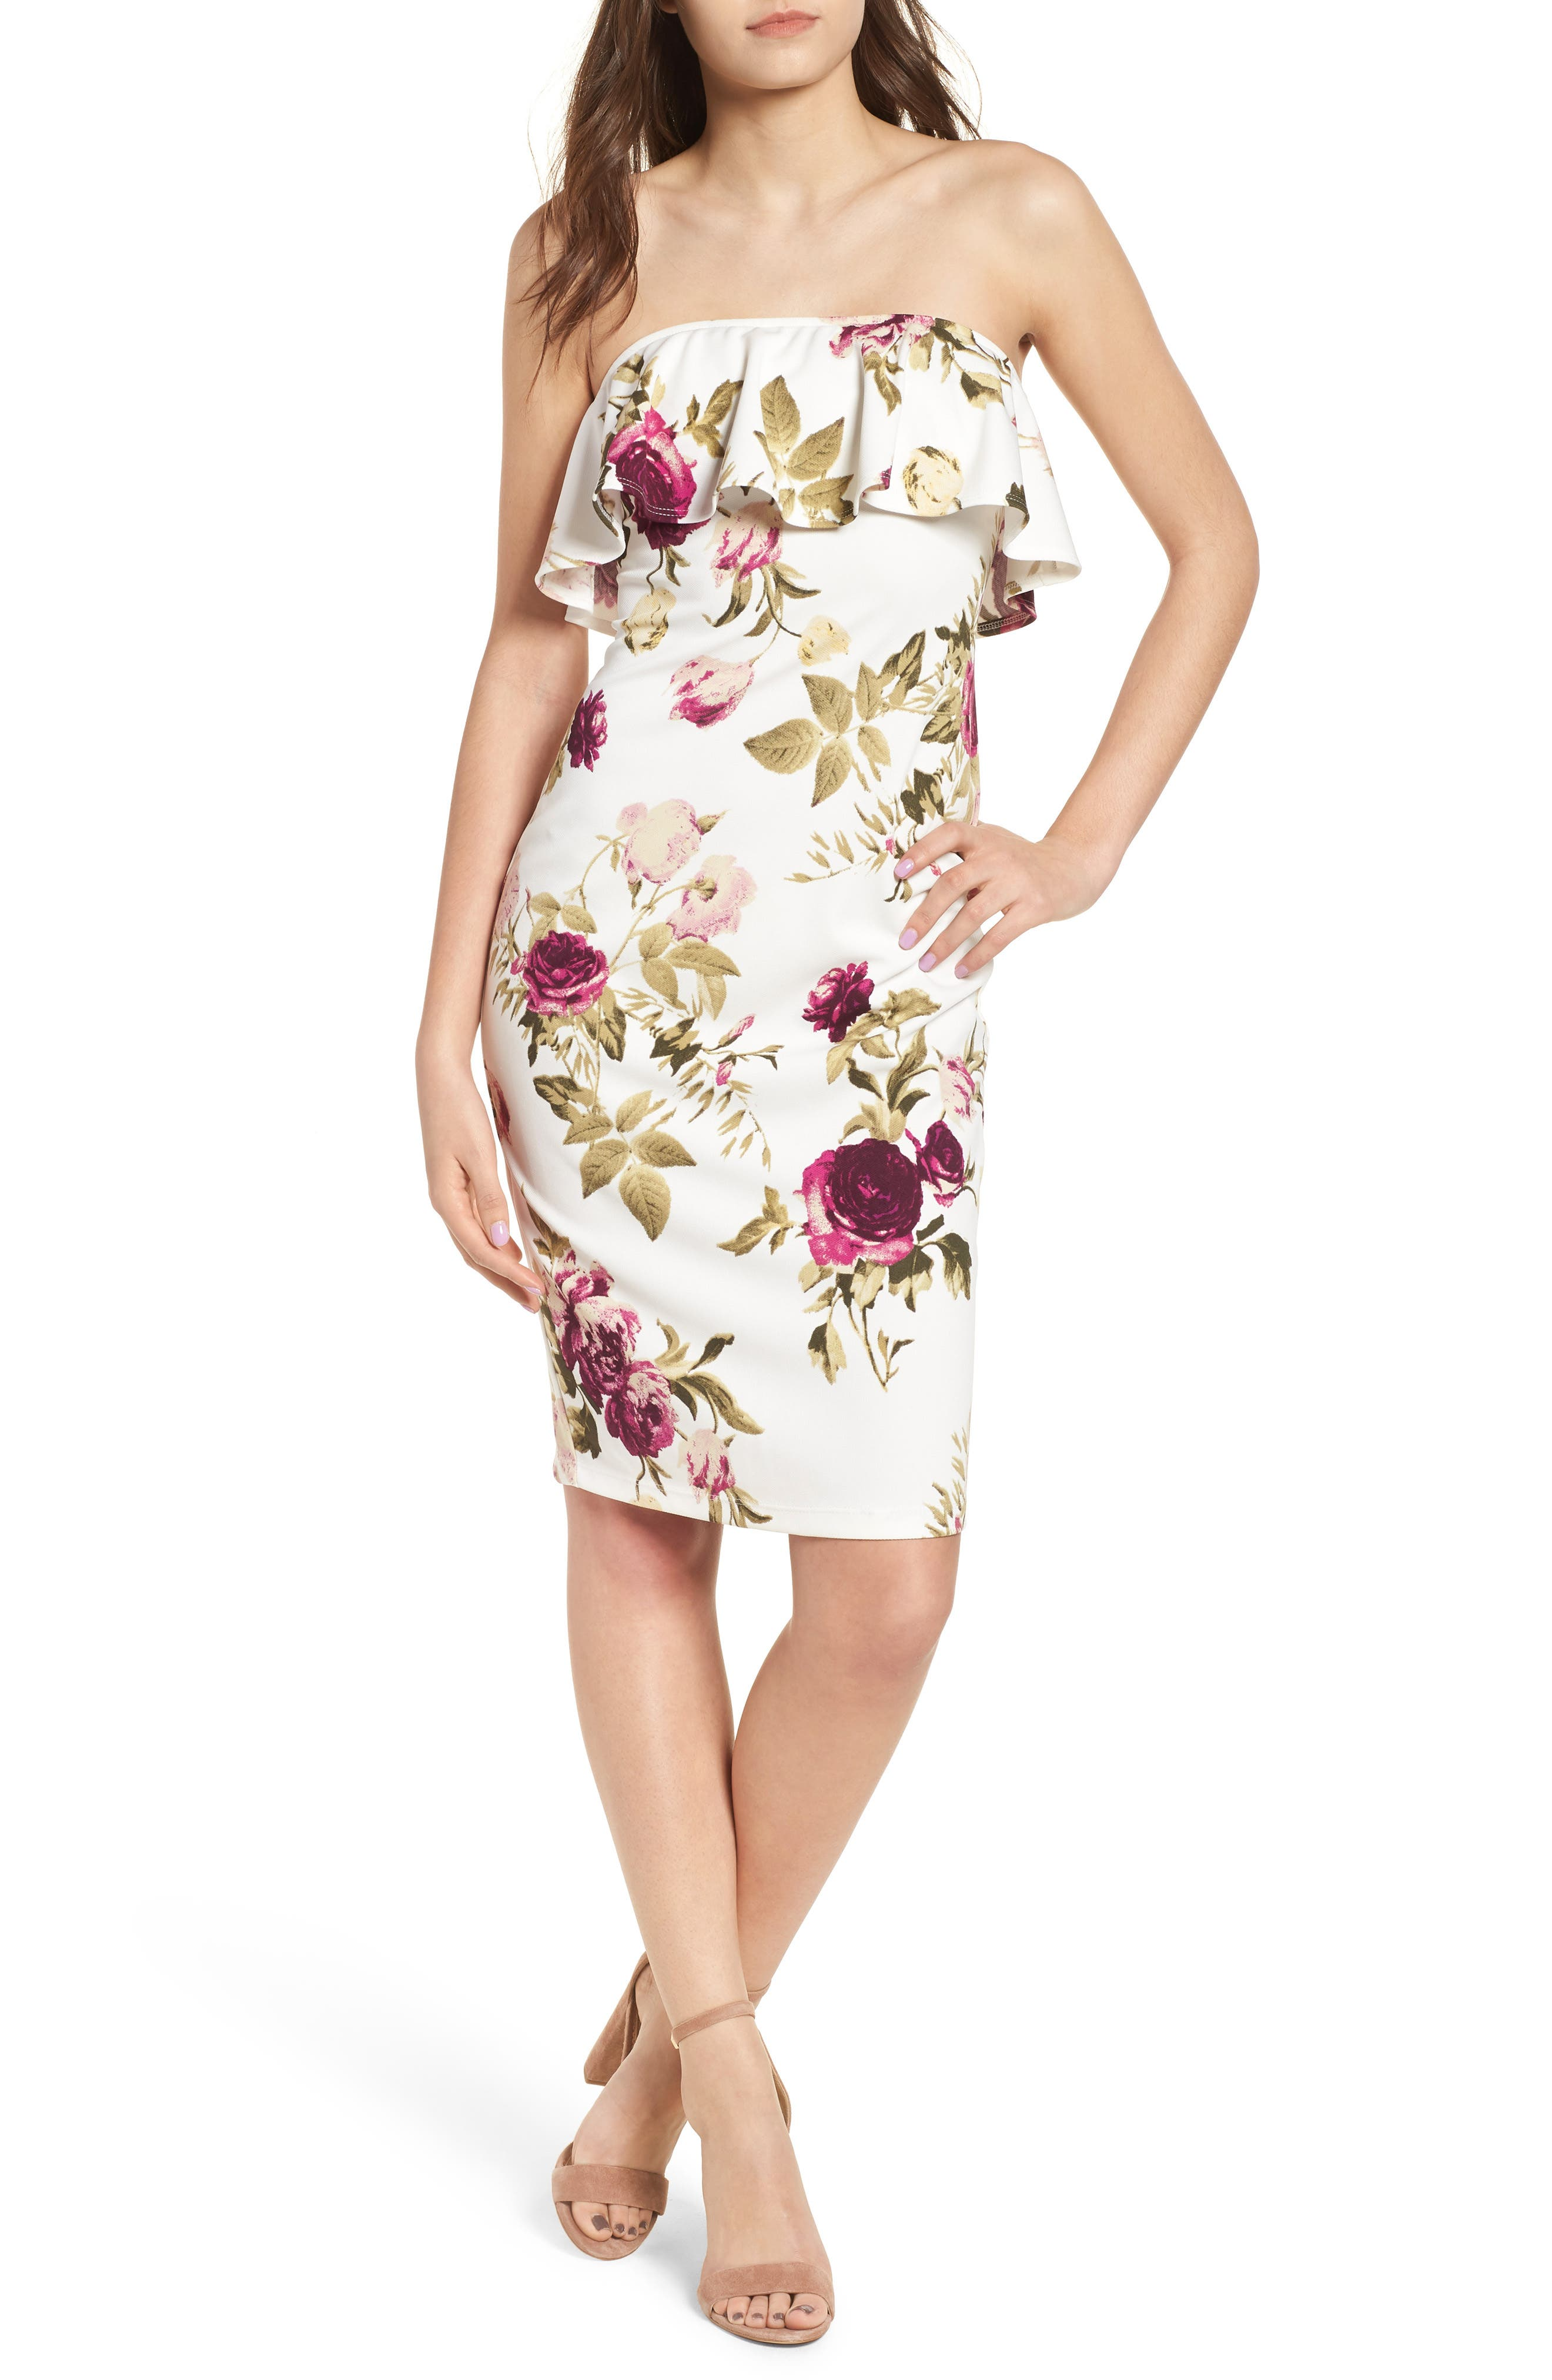 SPEECHLESS Strapless Flounce Dress, Main, color, 900